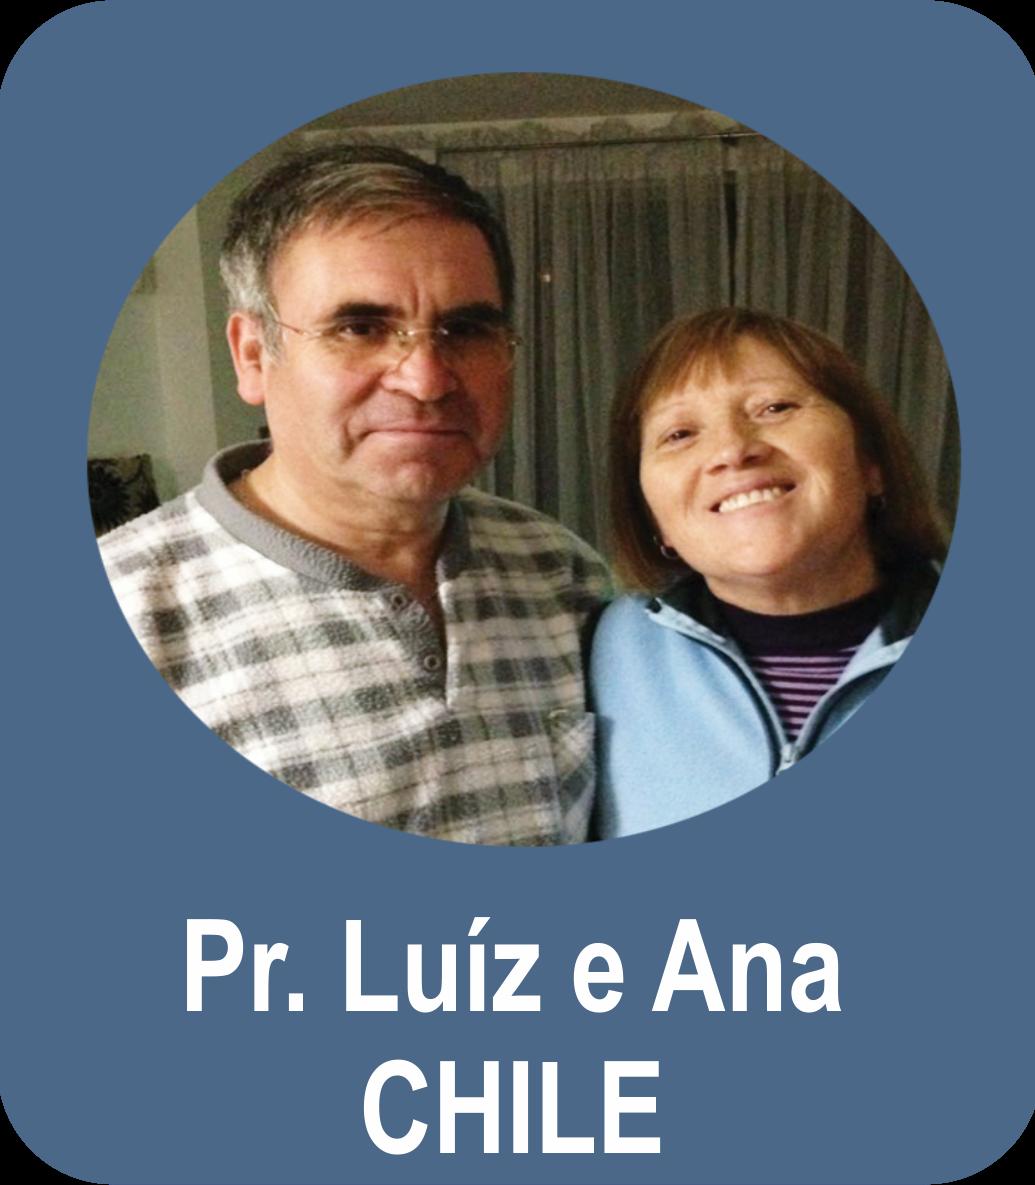 Missº. Luíz Alberto Morales Jara e Miss. Ana Nayade S. Gutierrez - CHILE - Santiago